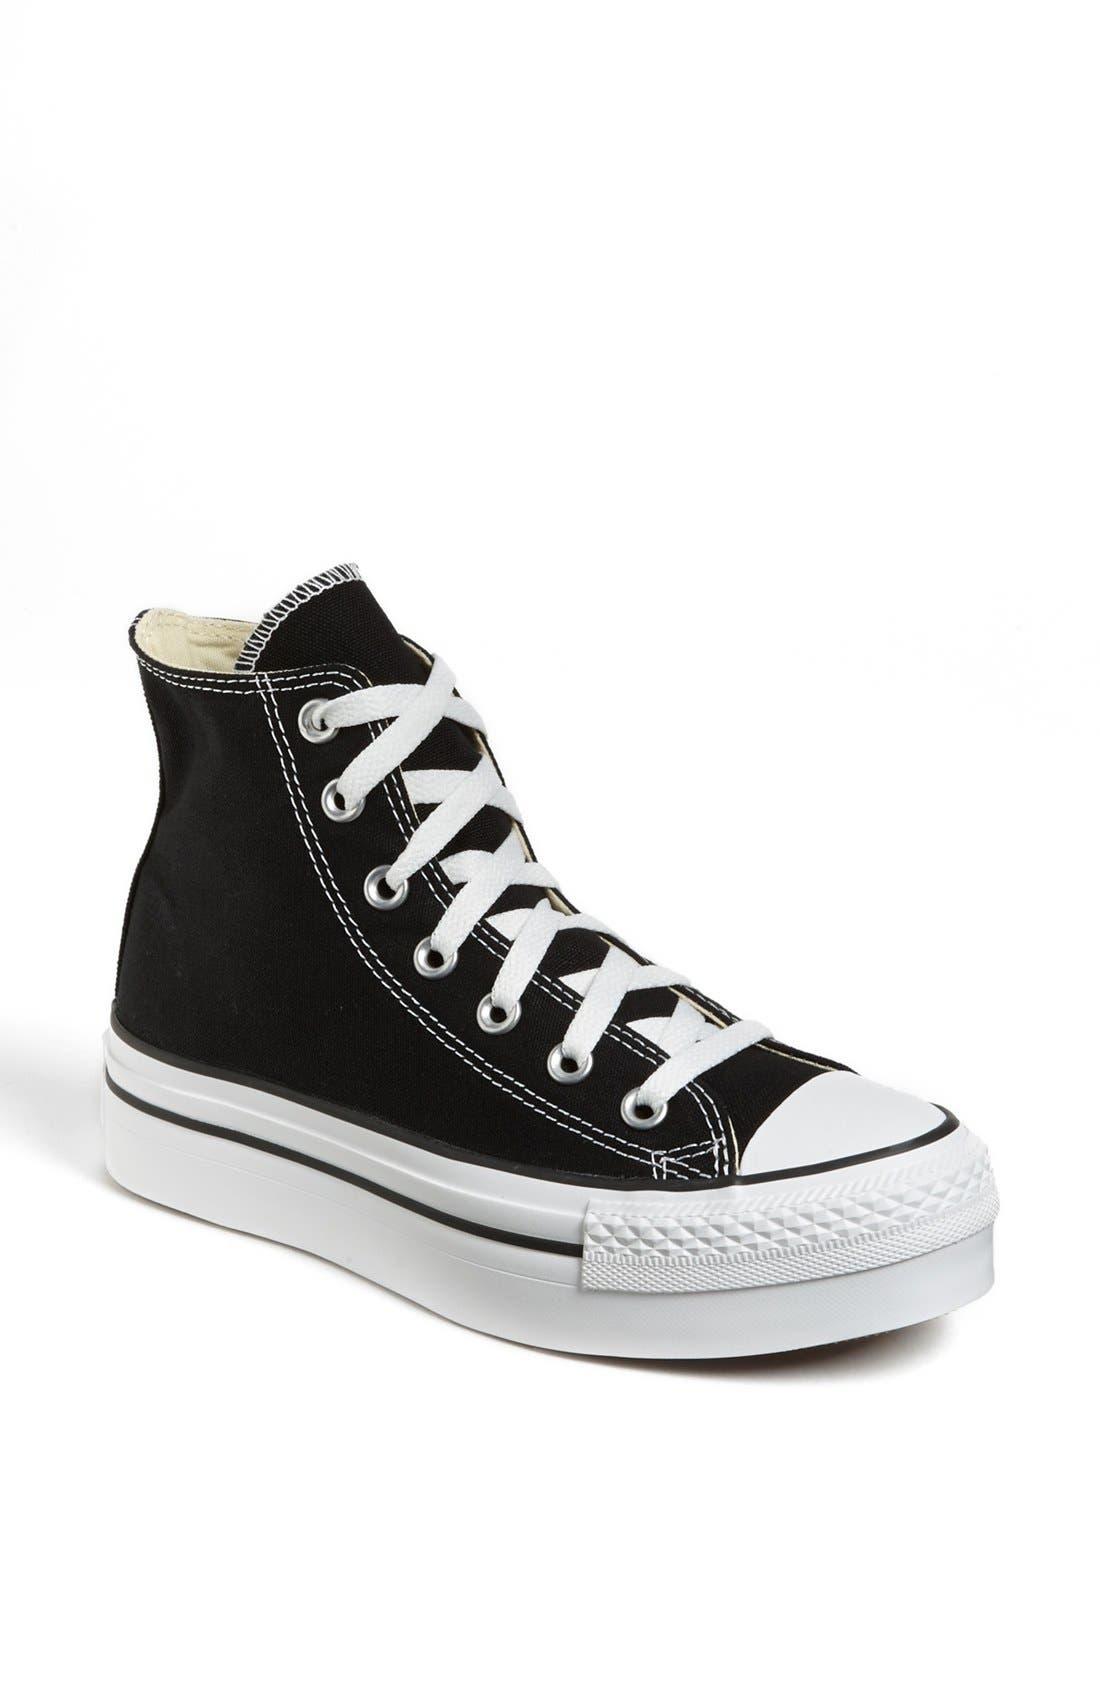 Alternate Image 1 Selected - Converse Chuck Taylor® High Top Platform Sneaker